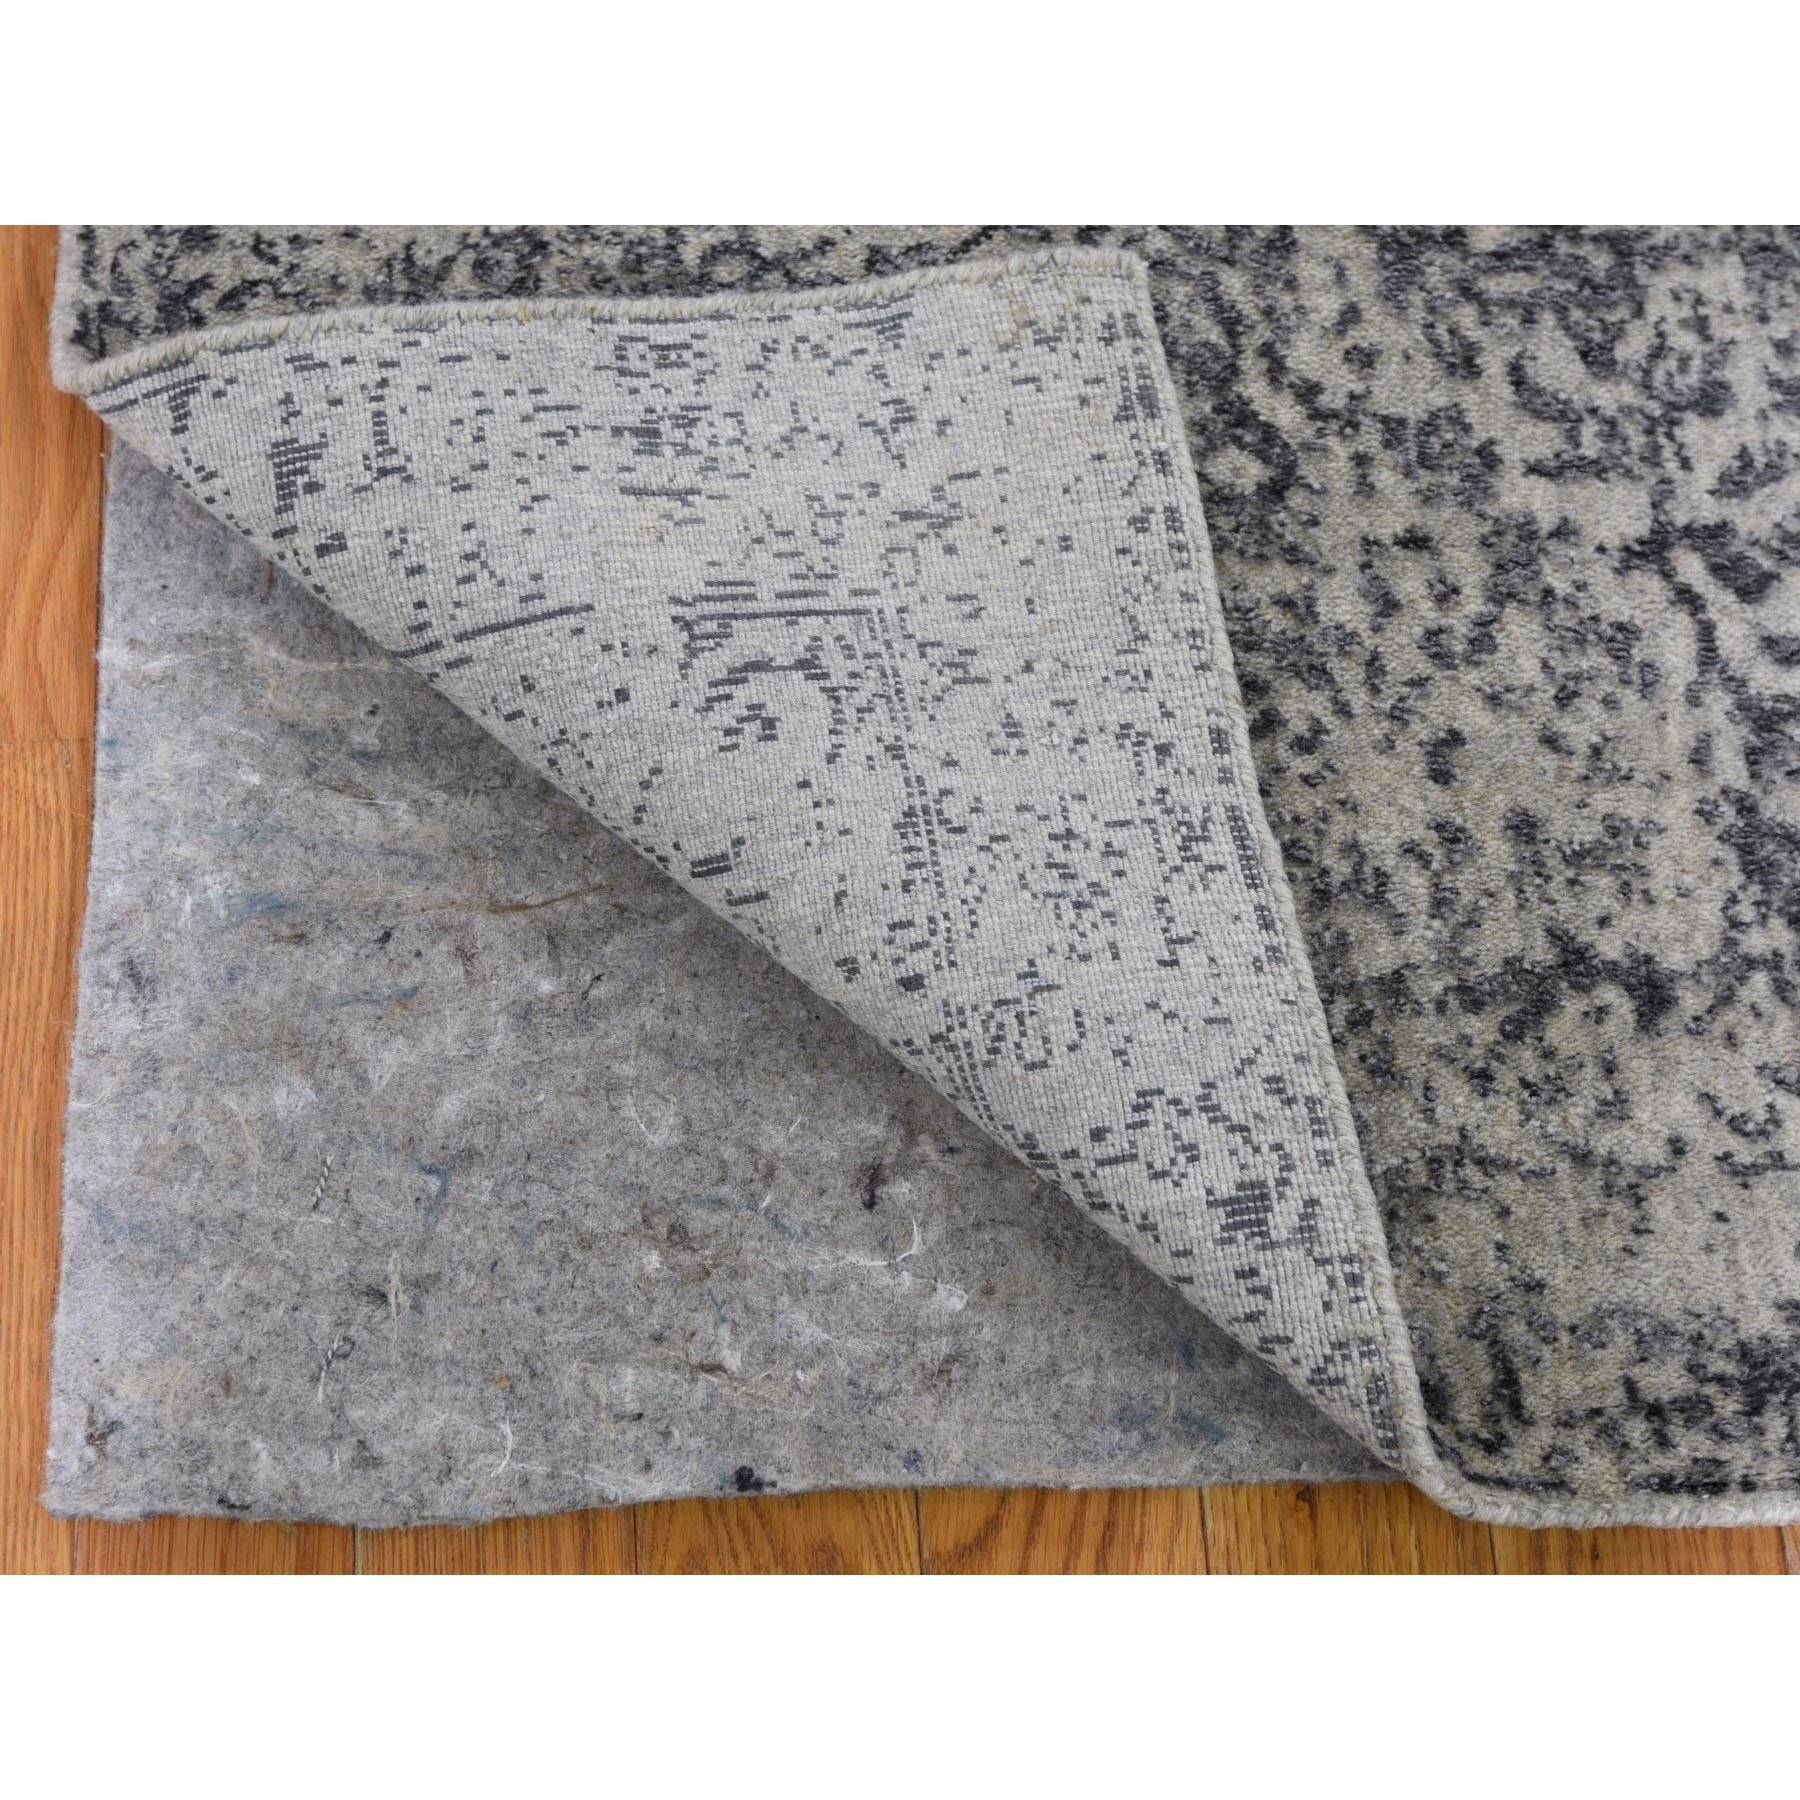 2-5 x10-1  Fine jacquard Hand Loomed Erased Design Wool And Silk Runner Oriental Rug